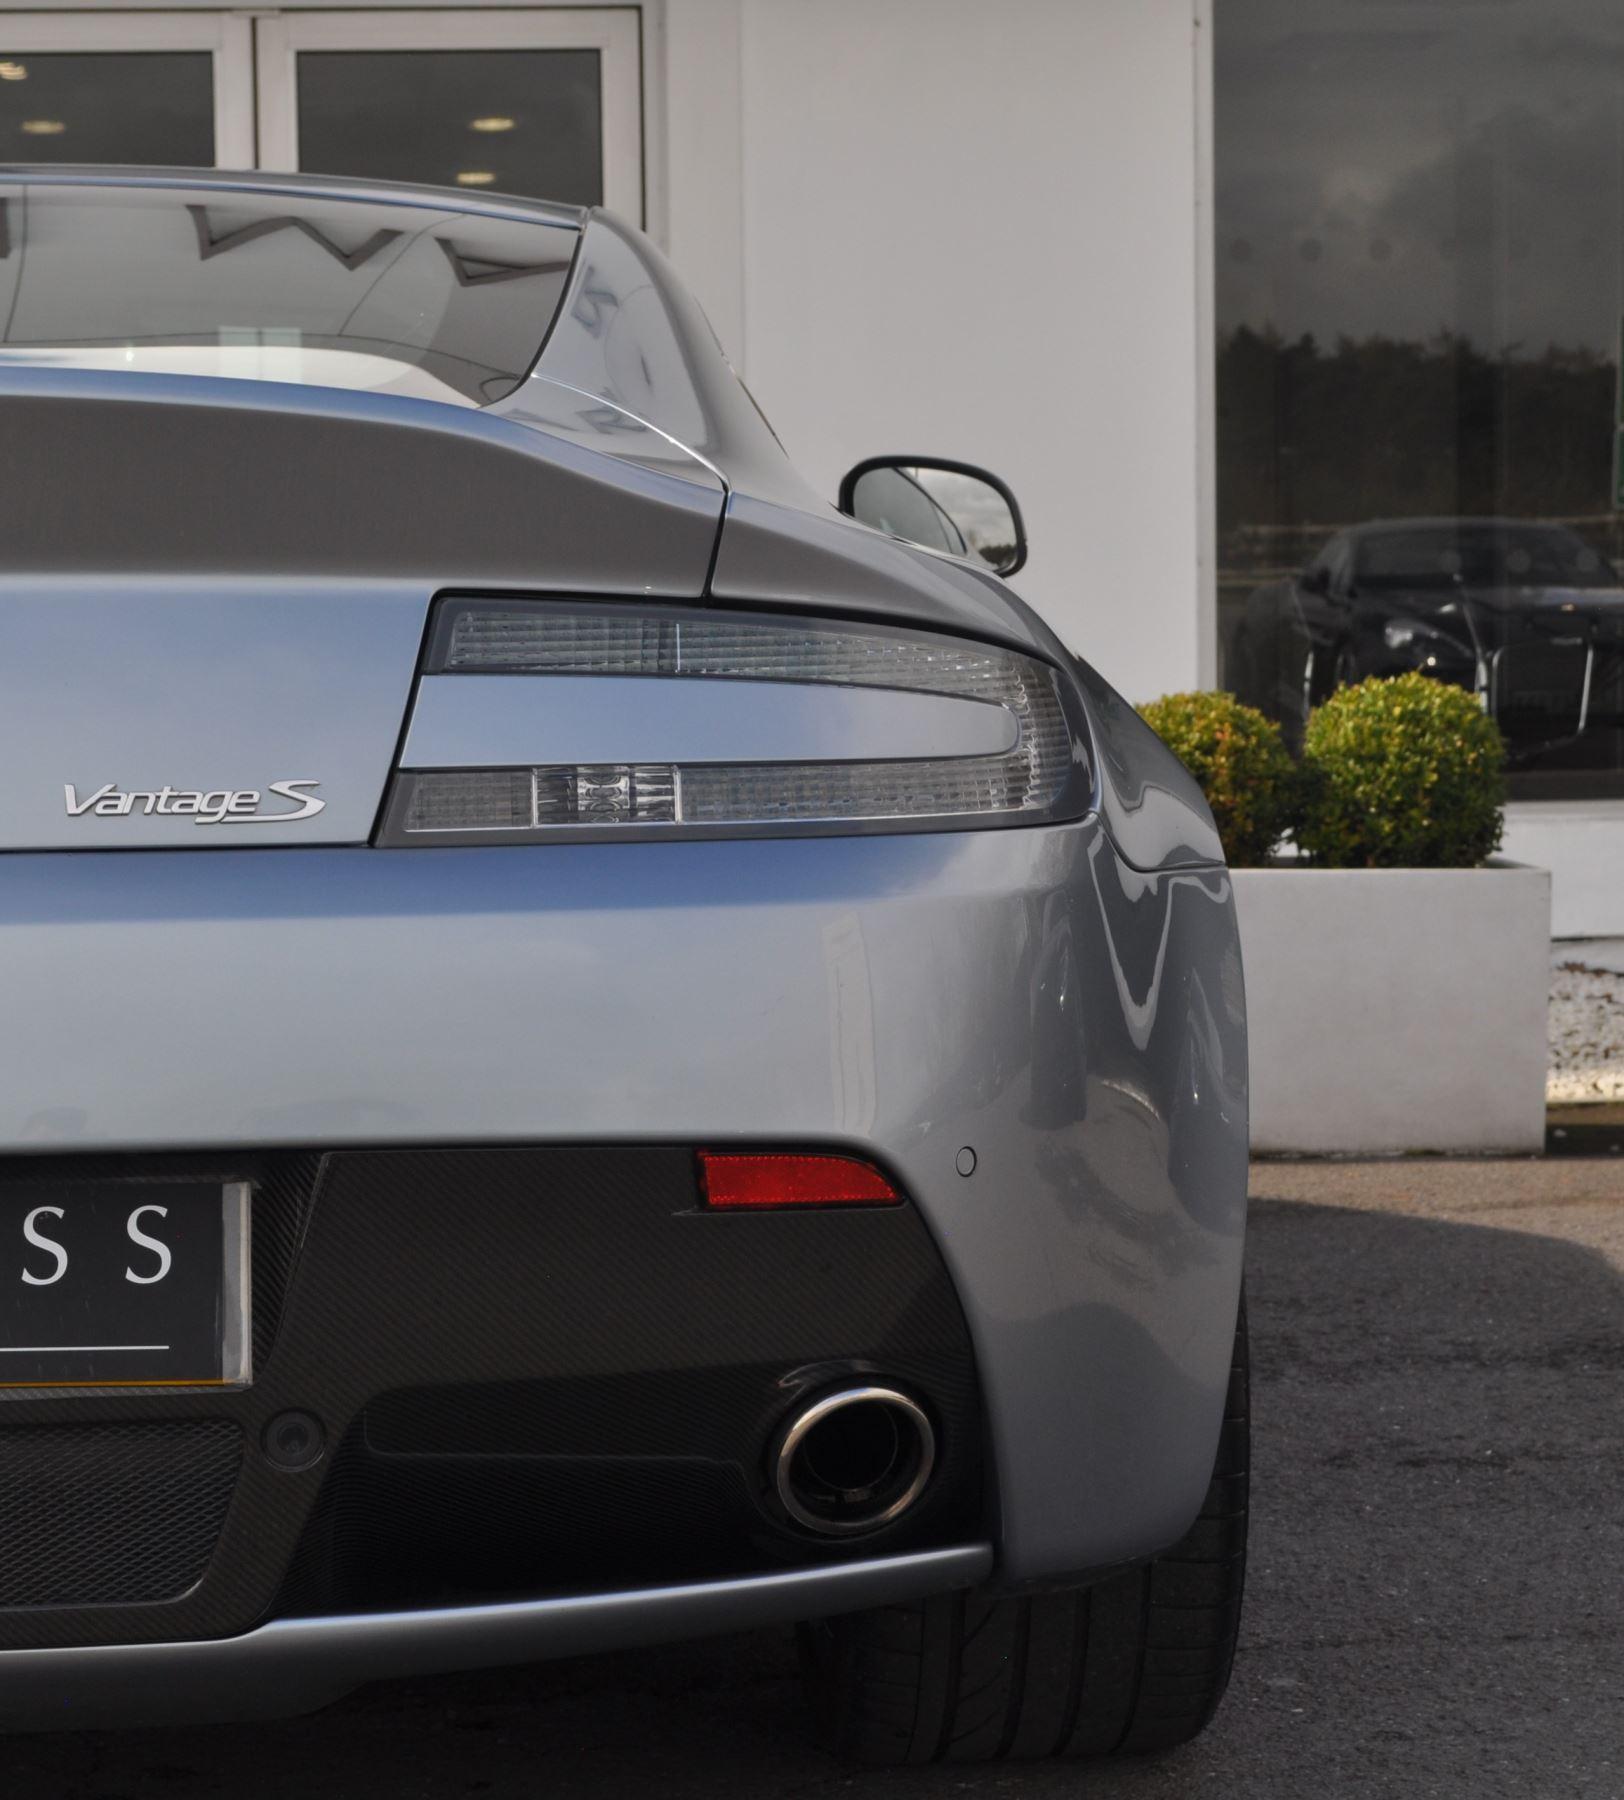 Aston Martin V8 Vantage S Coupe Coupe image 10